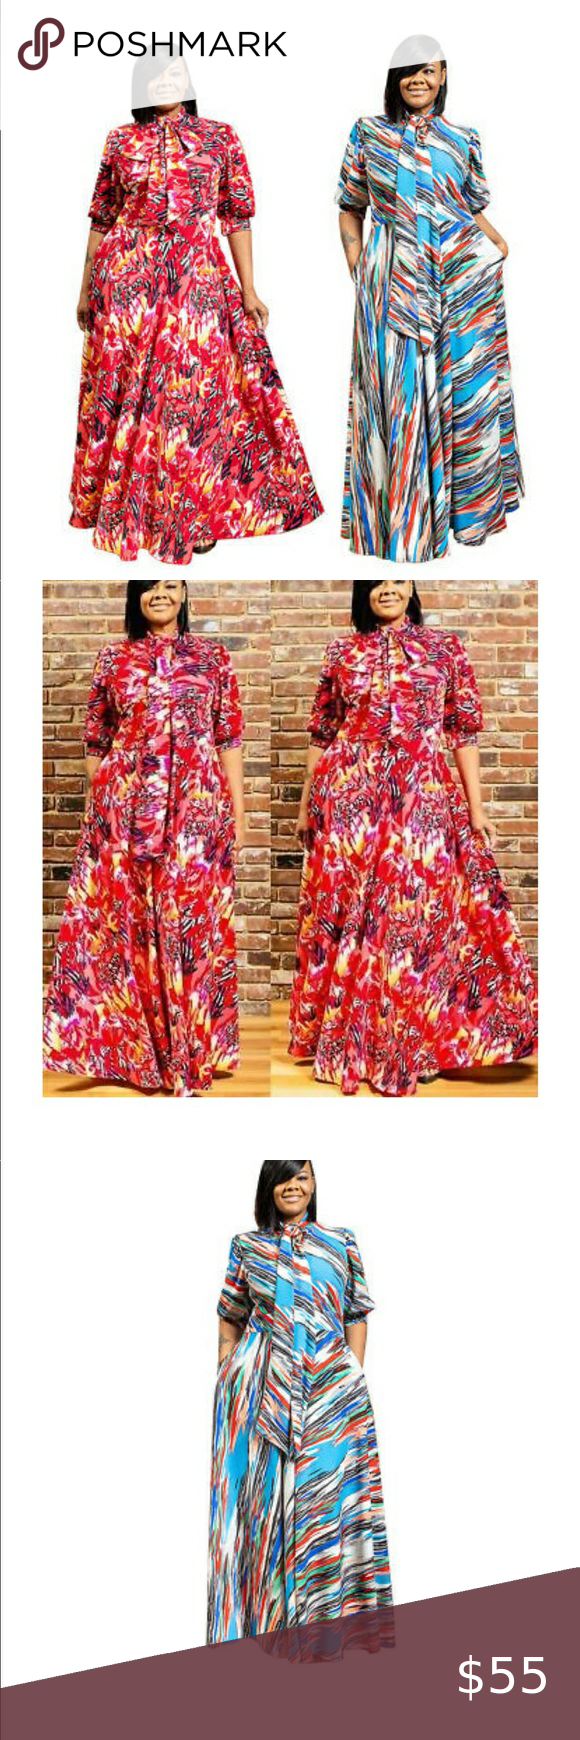 Long Printed Maxie Dress W Pockets Stripped Maxi Dresses Brown Maxi Dresses Peasant Style Dress [ 1740 x 580 Pixel ]